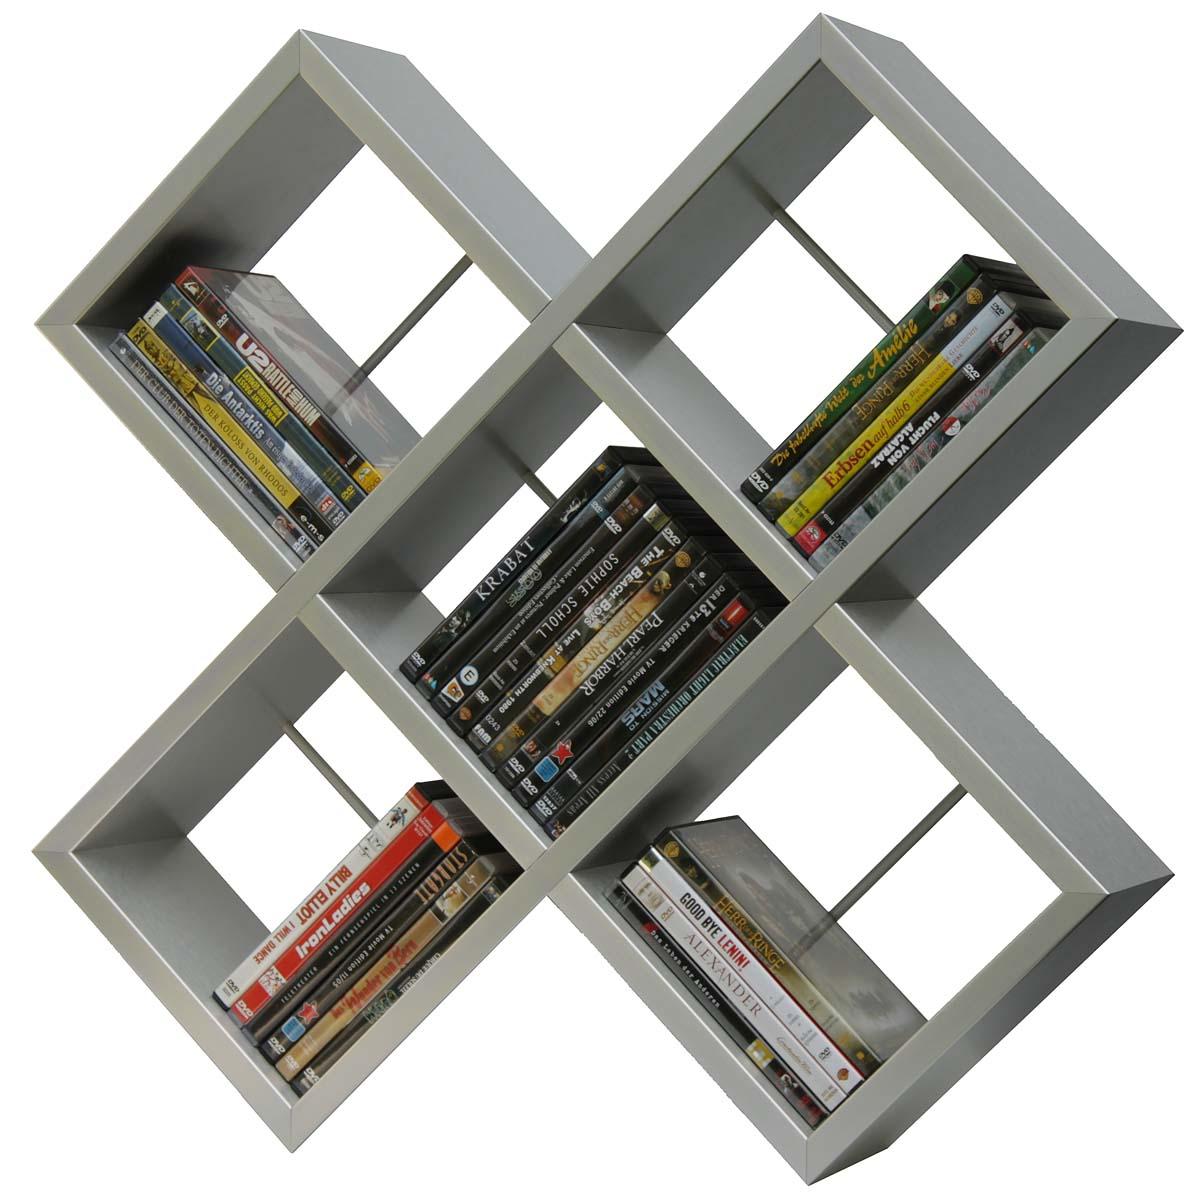 dvd regale platteninform ingo pollmar berlin. Black Bedroom Furniture Sets. Home Design Ideas